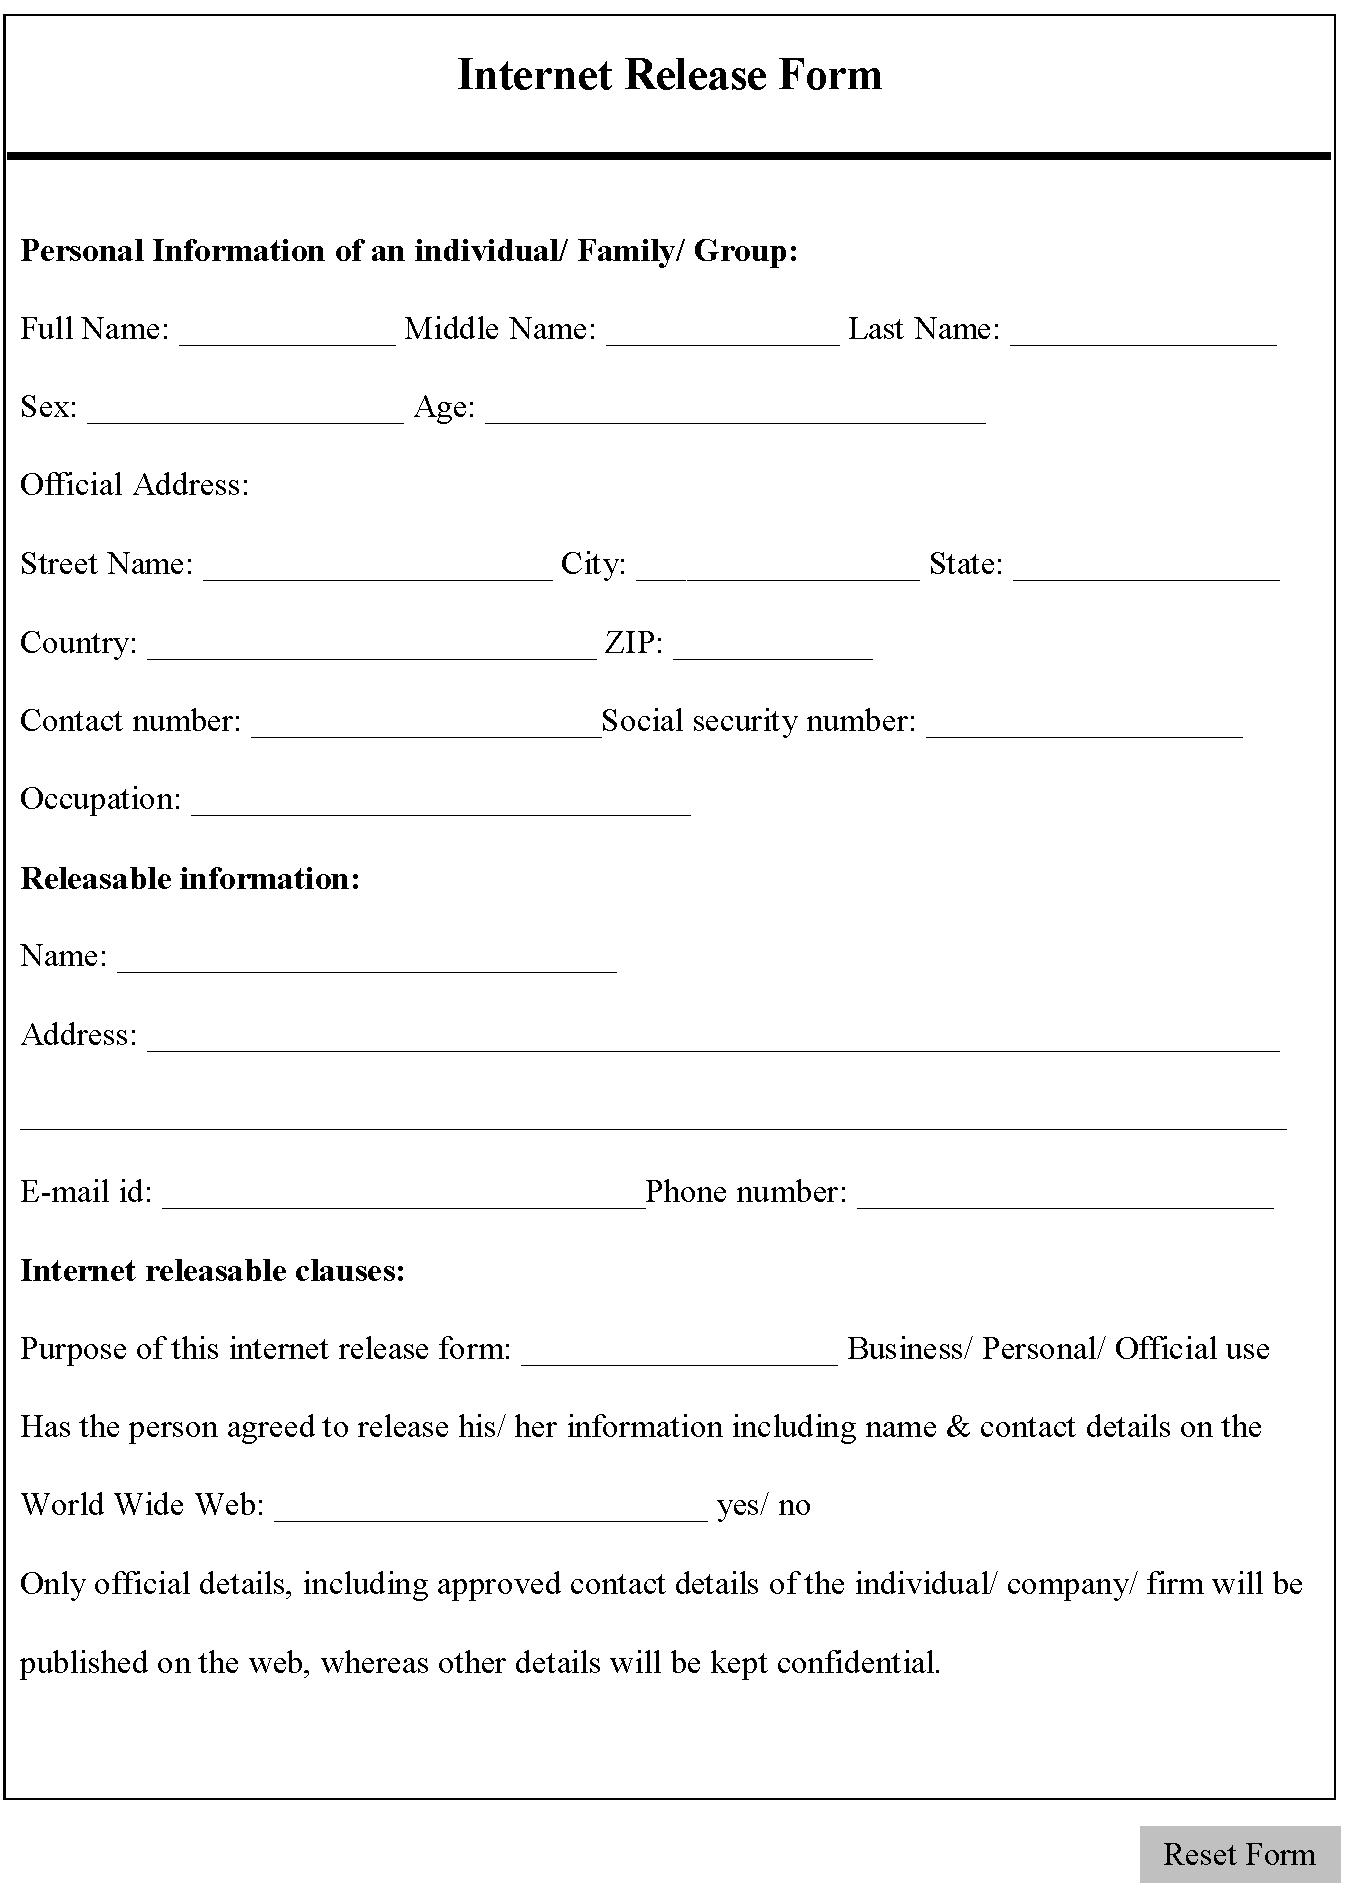 Internet Release Form